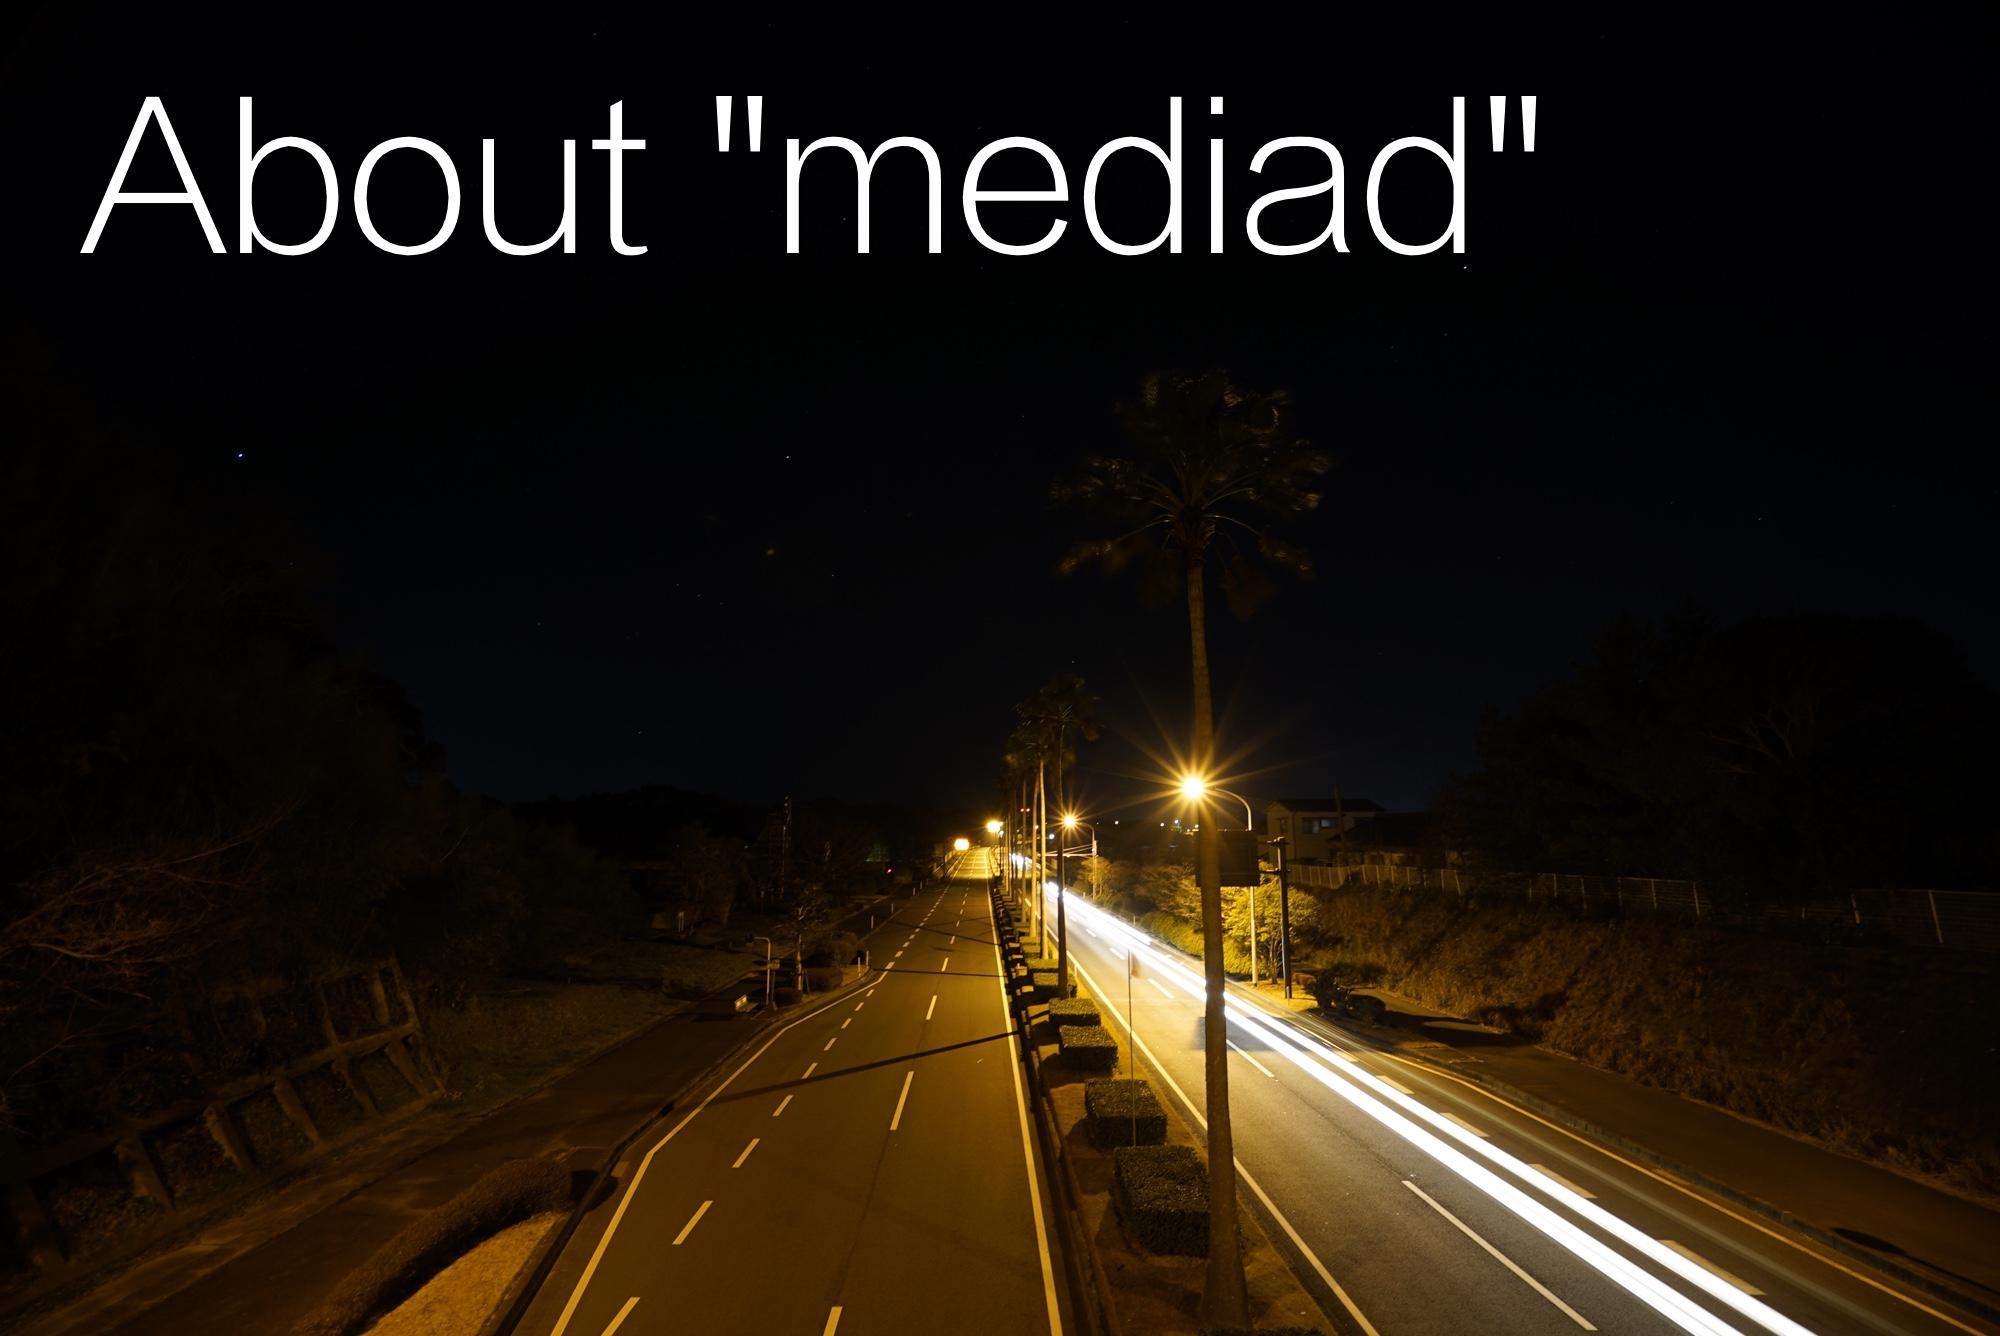 mediad とは?